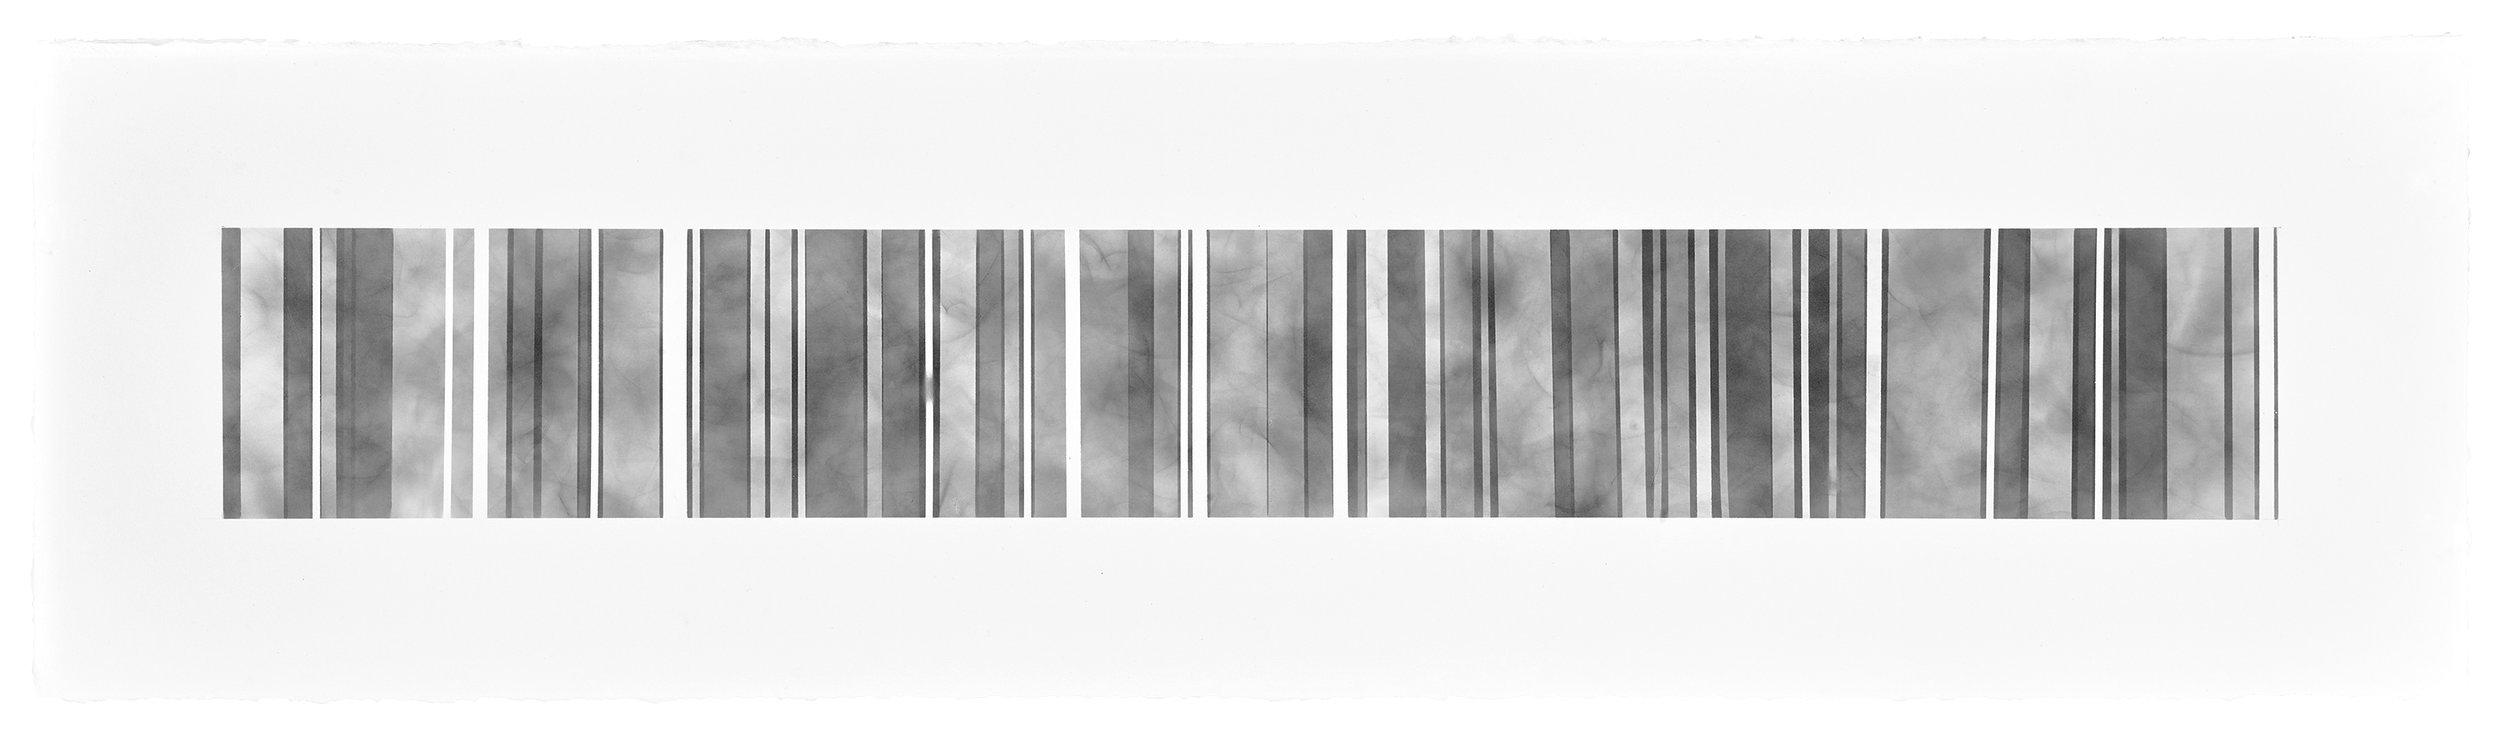 Barcode Series D, 9, 2018 copy.jpg